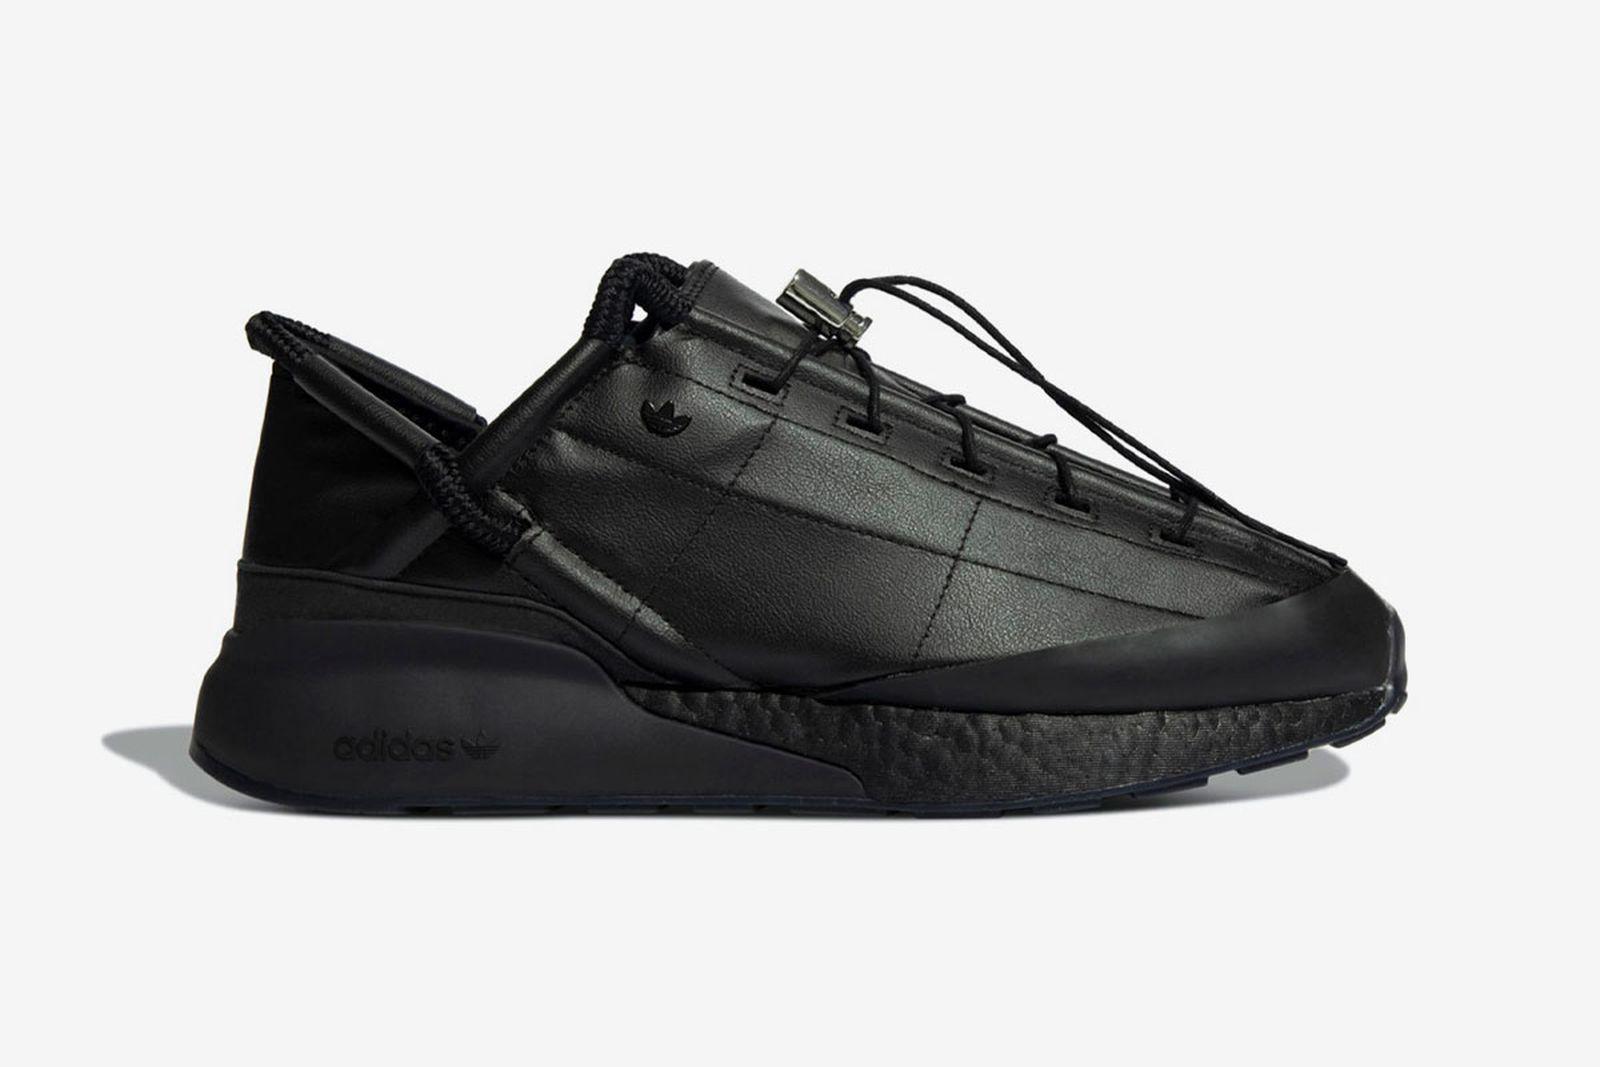 craig-green-adidas-zx-2k-phormar-ii-release-date-price-01